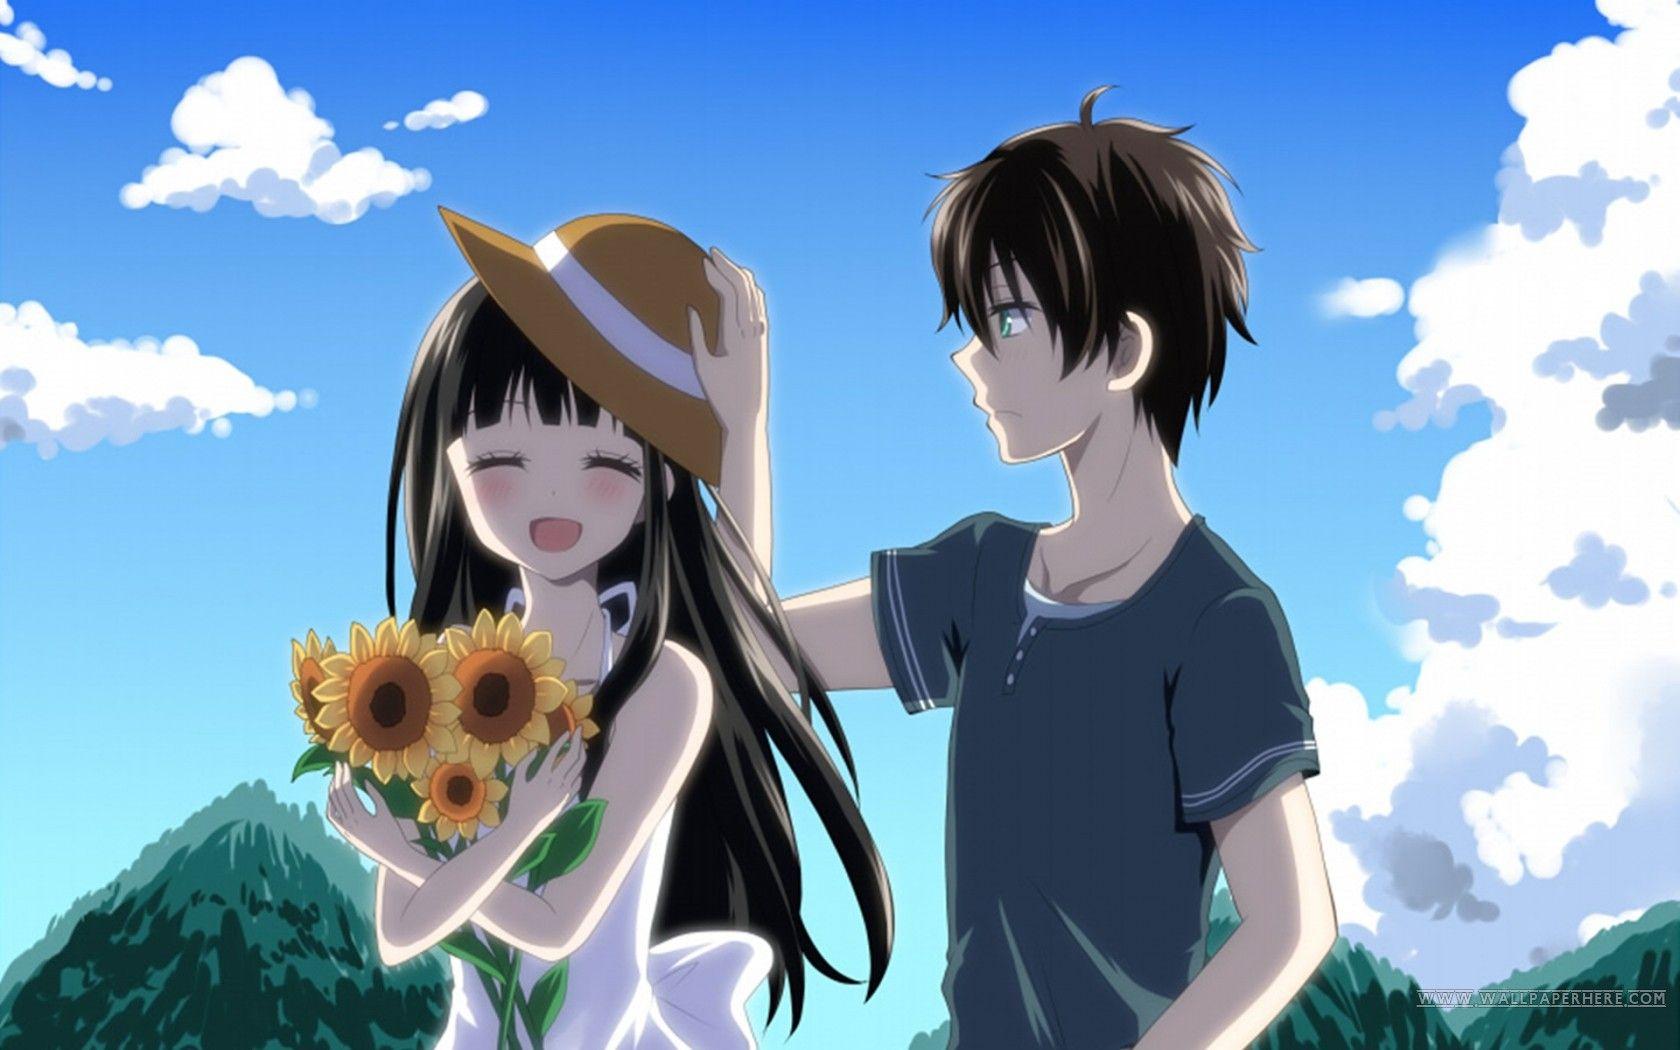 Anime Love Story Anime Love Kawaii Cute Kurdishotaku Art Couple Image أنمي رومانسي صور كاواي كيوت آرت أحبك Anime Hoạt Hinh Hoang đạo